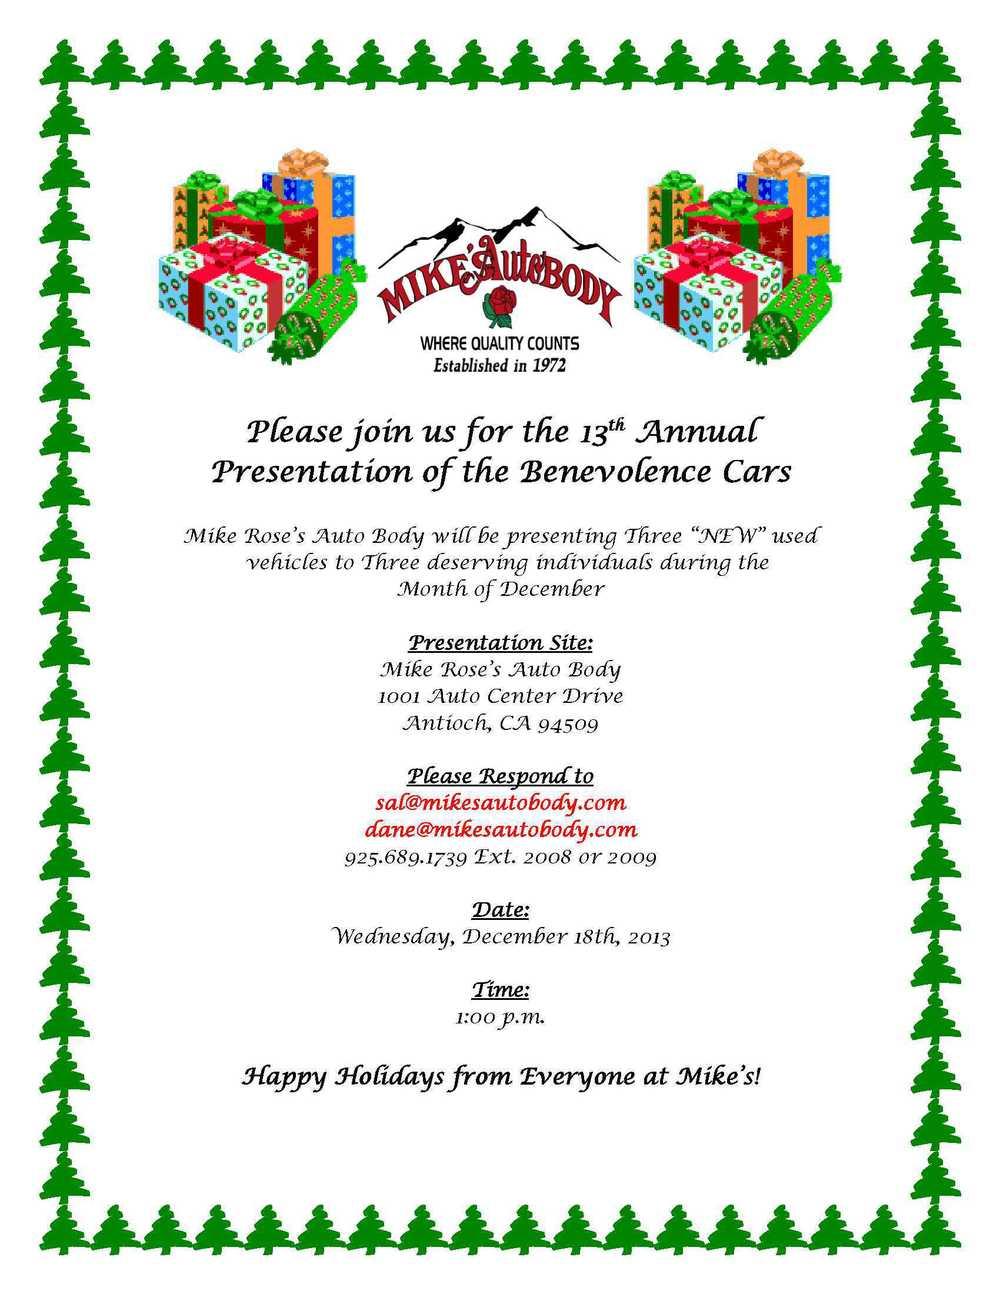 2013-12 Mikes Autobody Benevolence 2013 Invitation.jpg